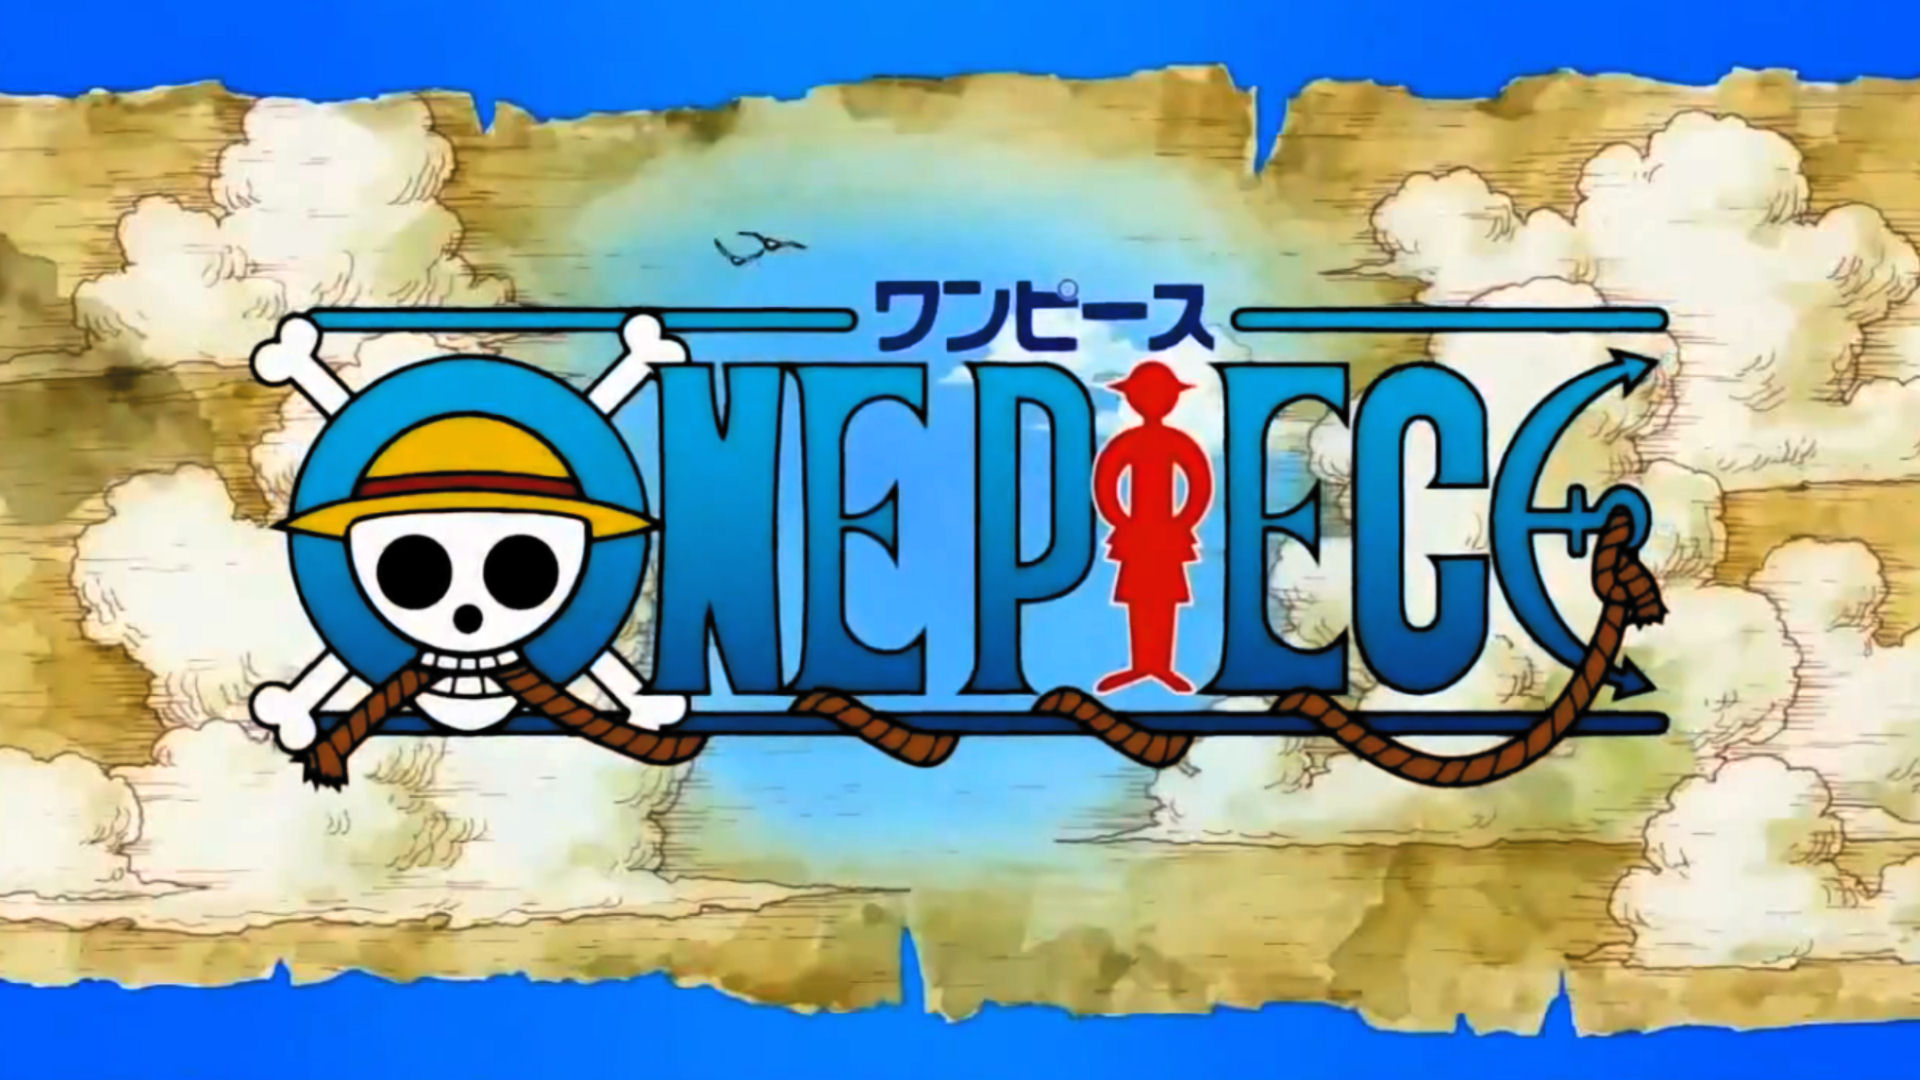 One Piece Wallpaper Hd Wallpapersafari